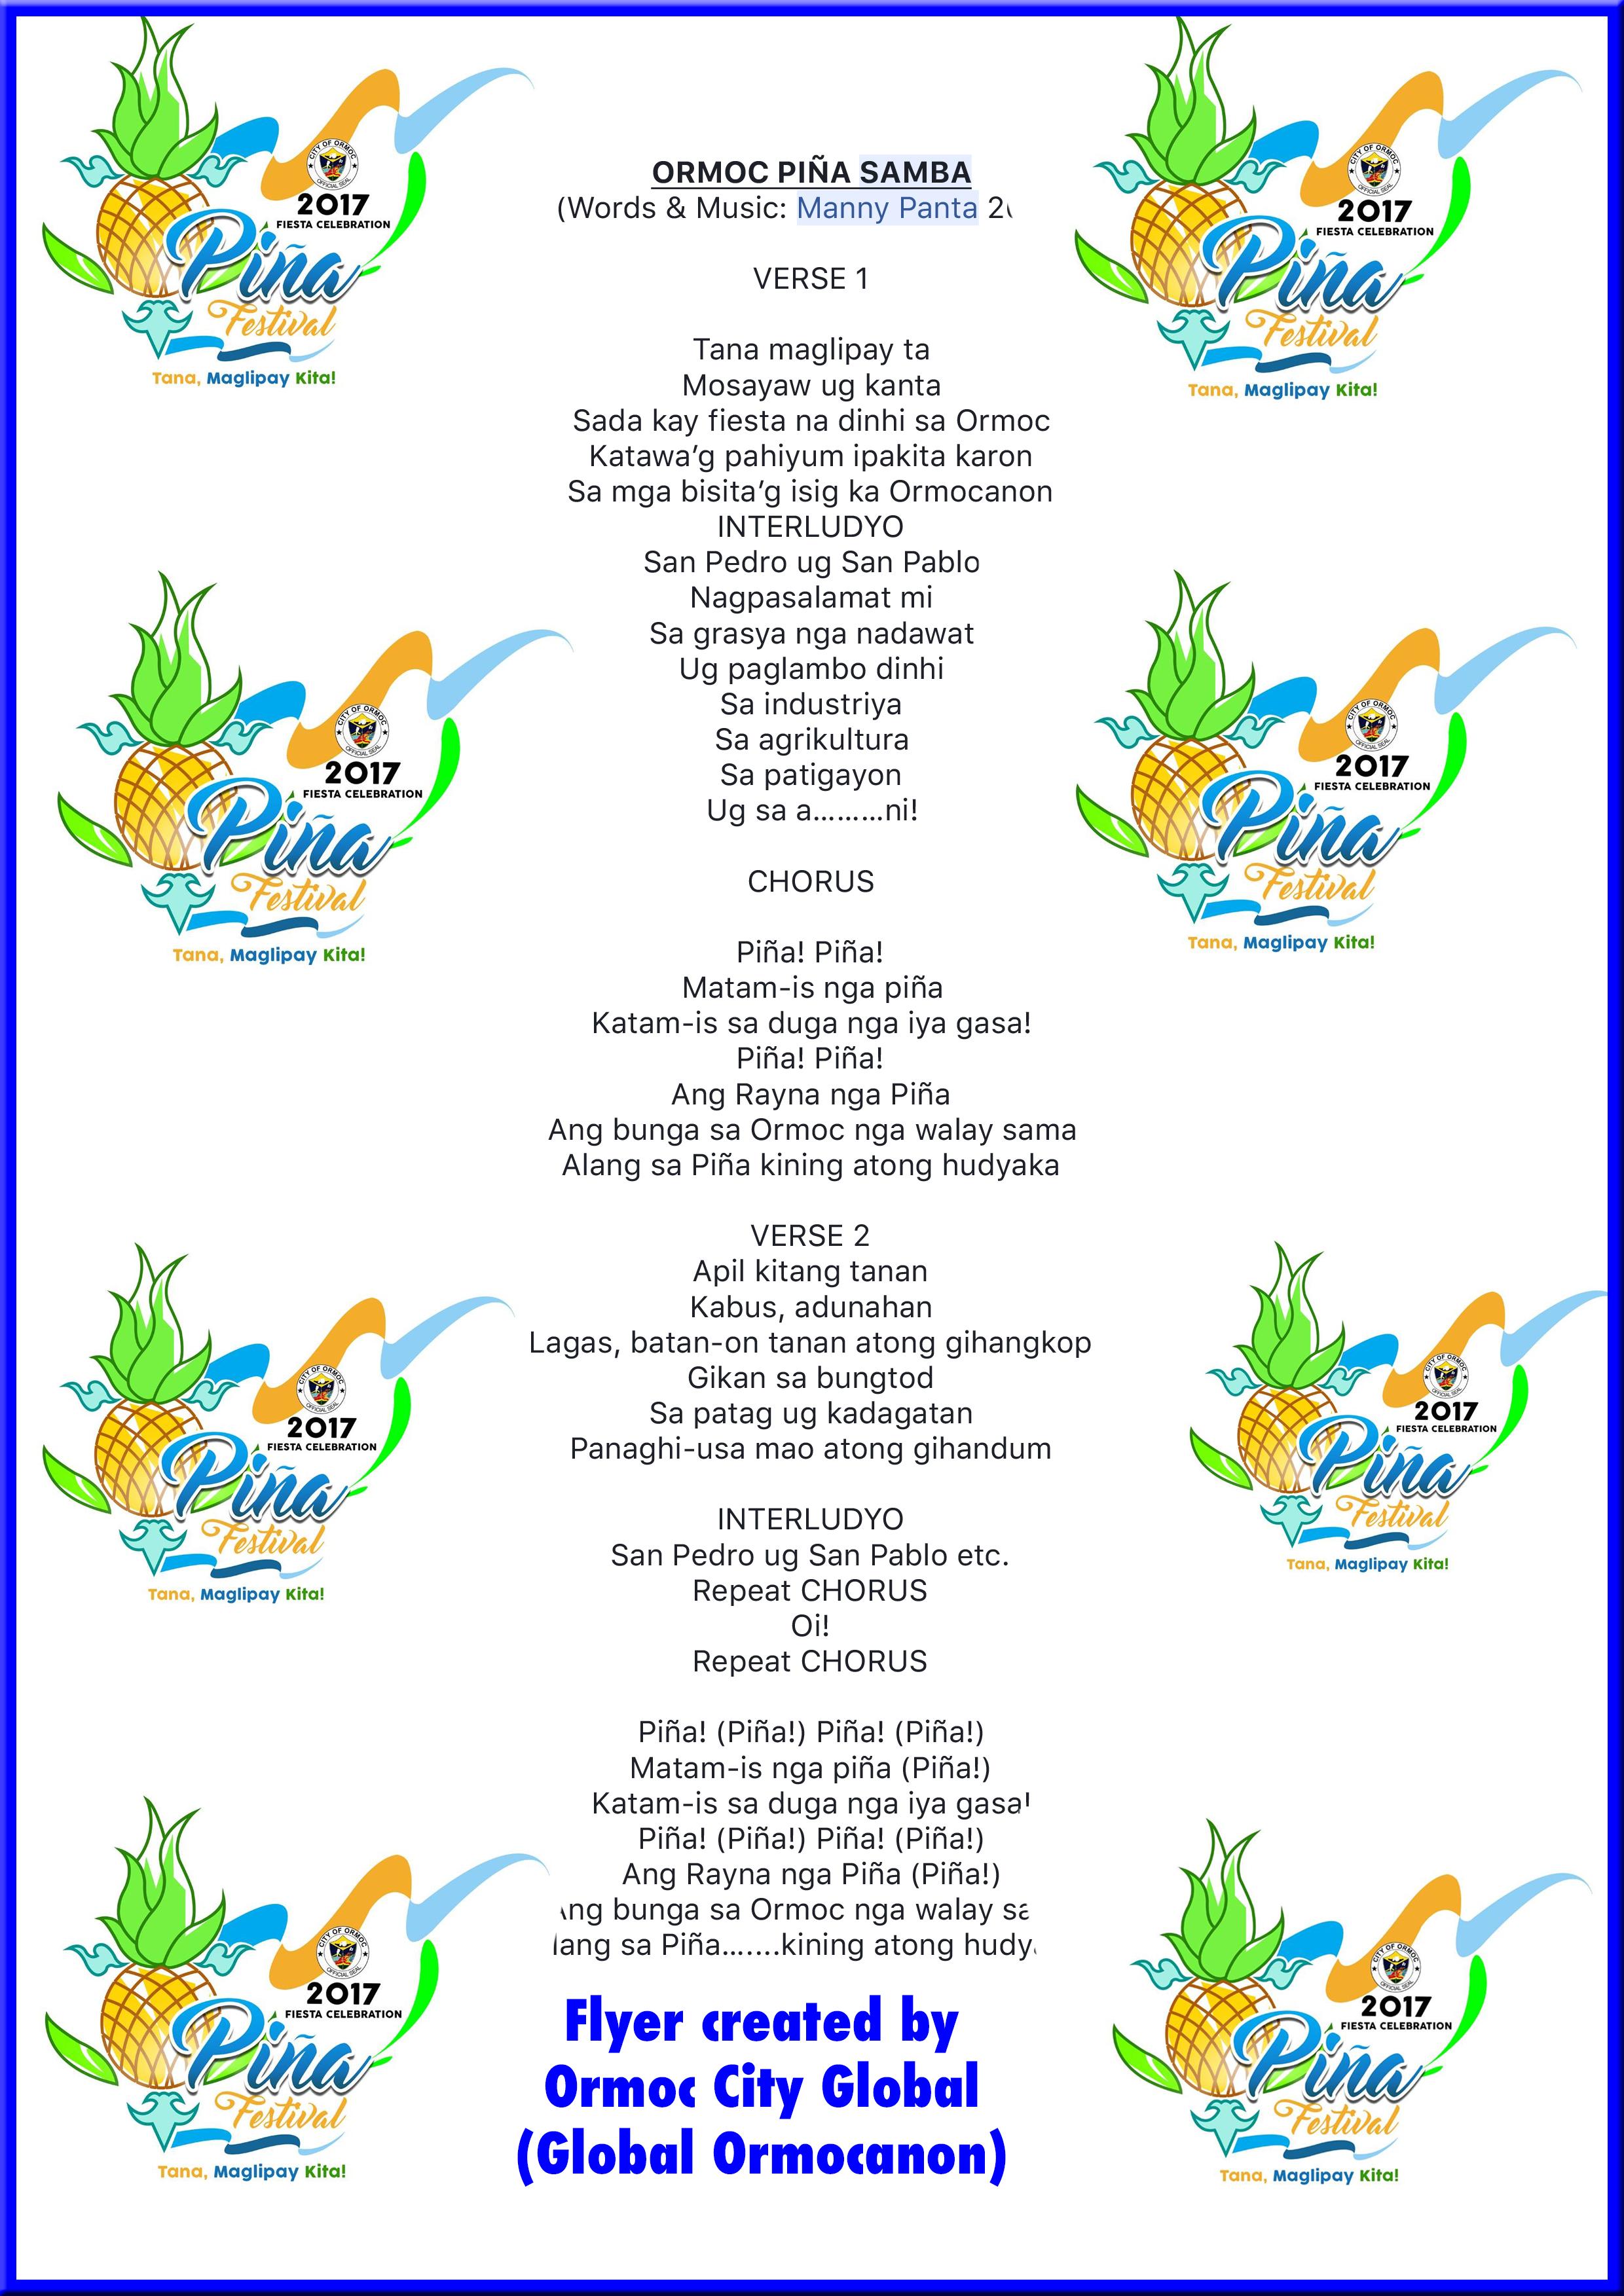 Ormoc Piña Samba Lyrics